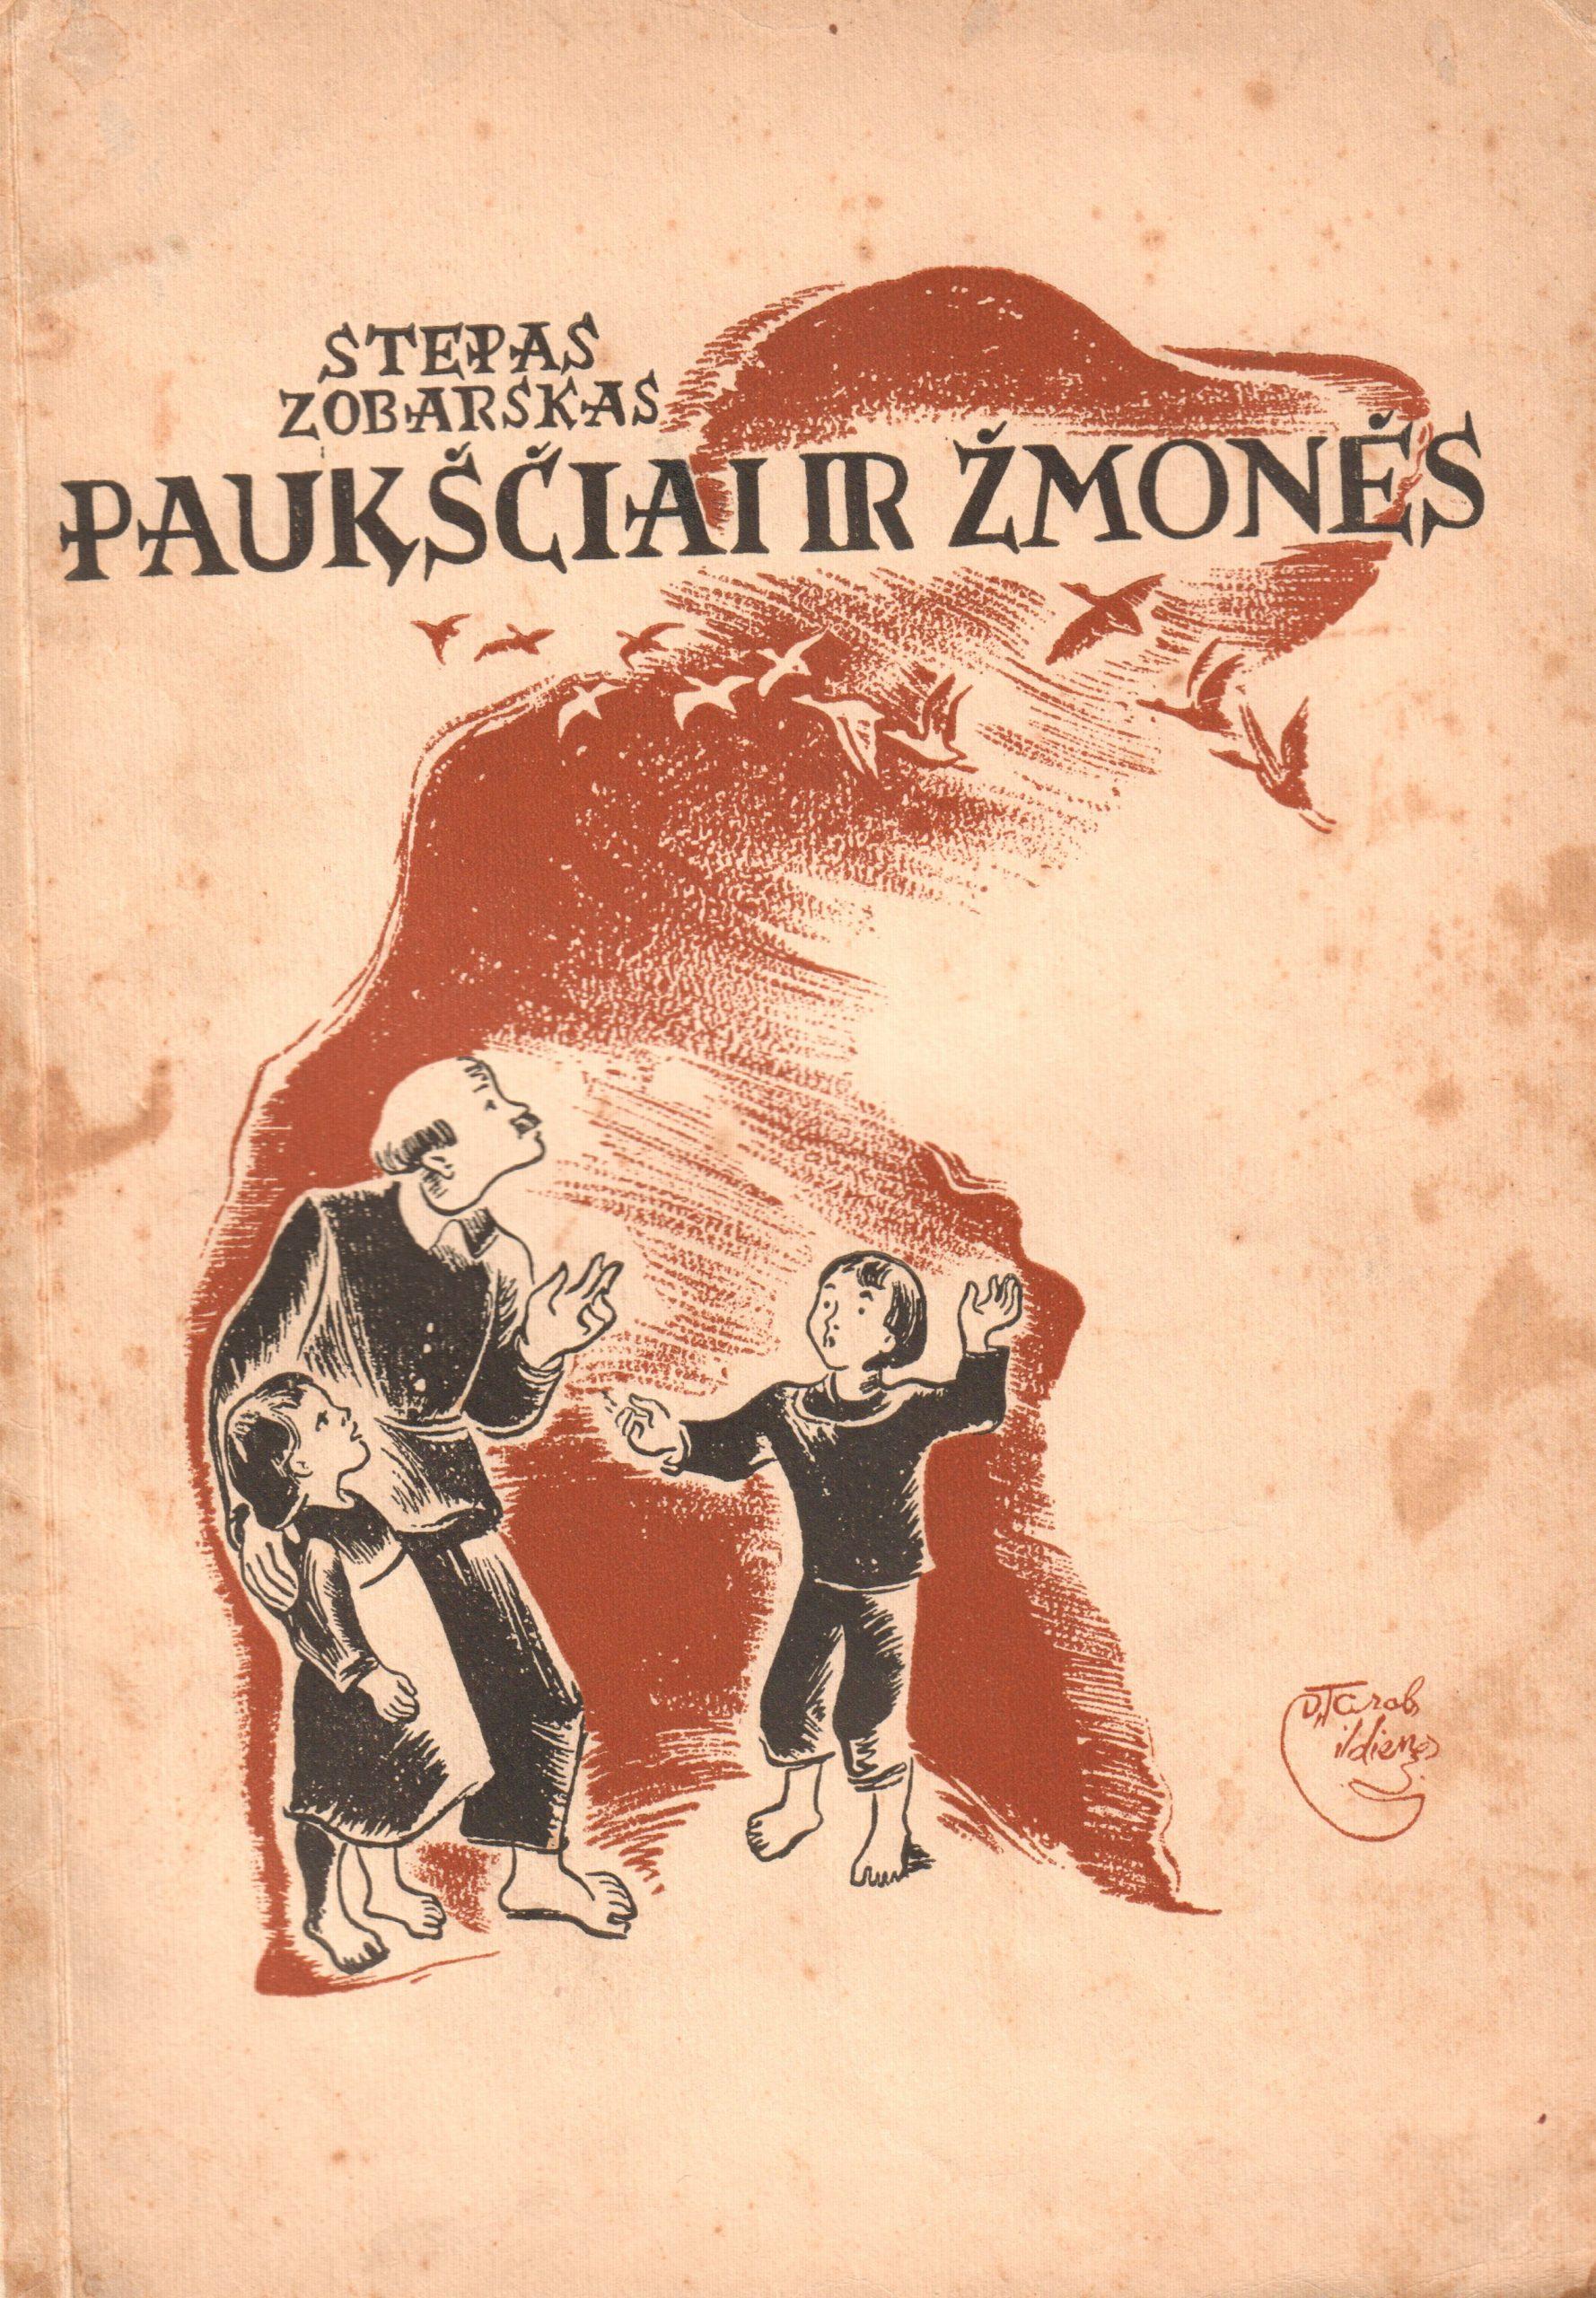 1940 m. D, Tarabildienės iliustracijos